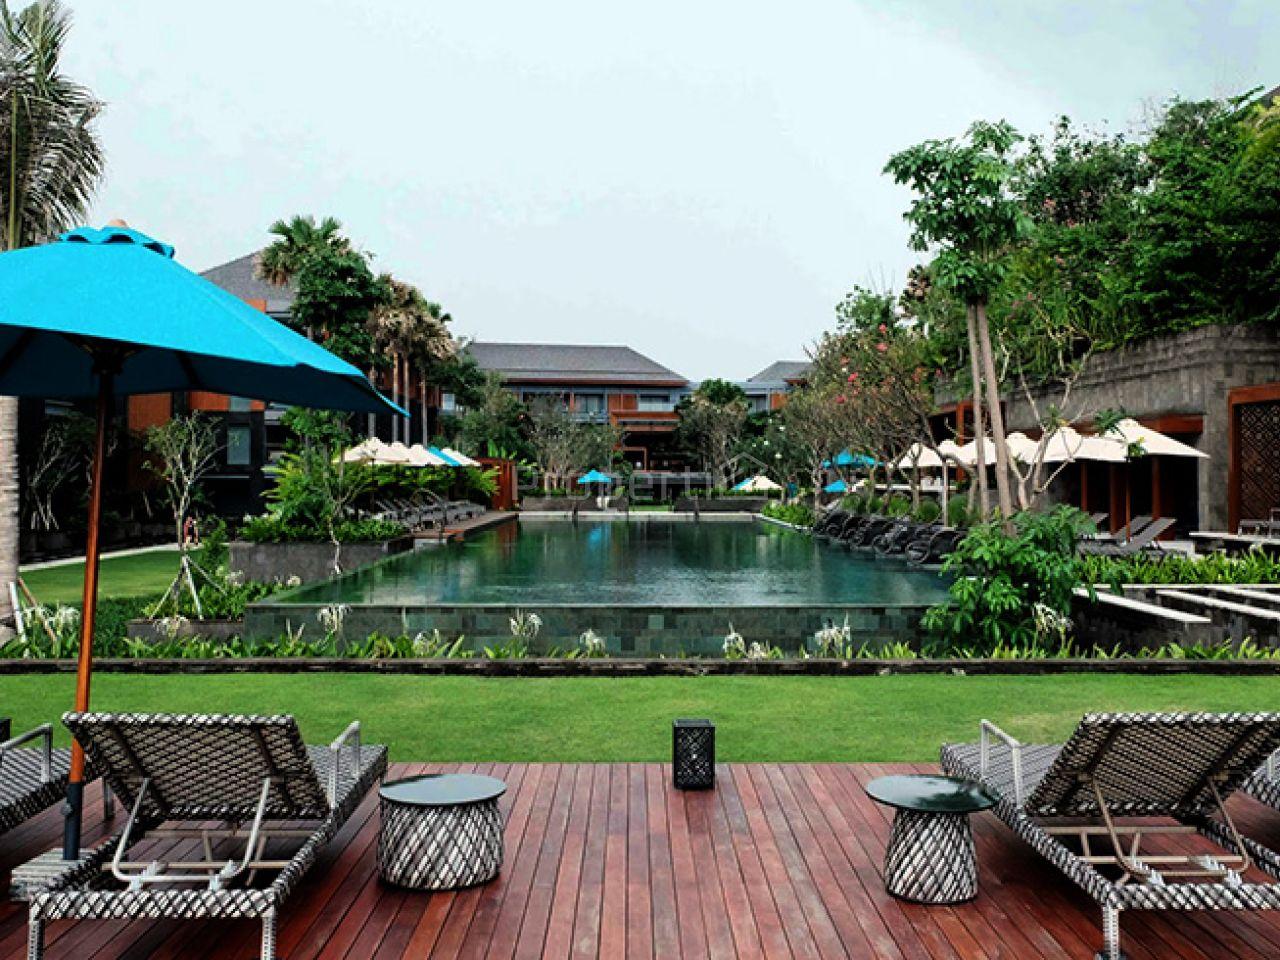 Hotel Baru di Seminyak Bali, Bali